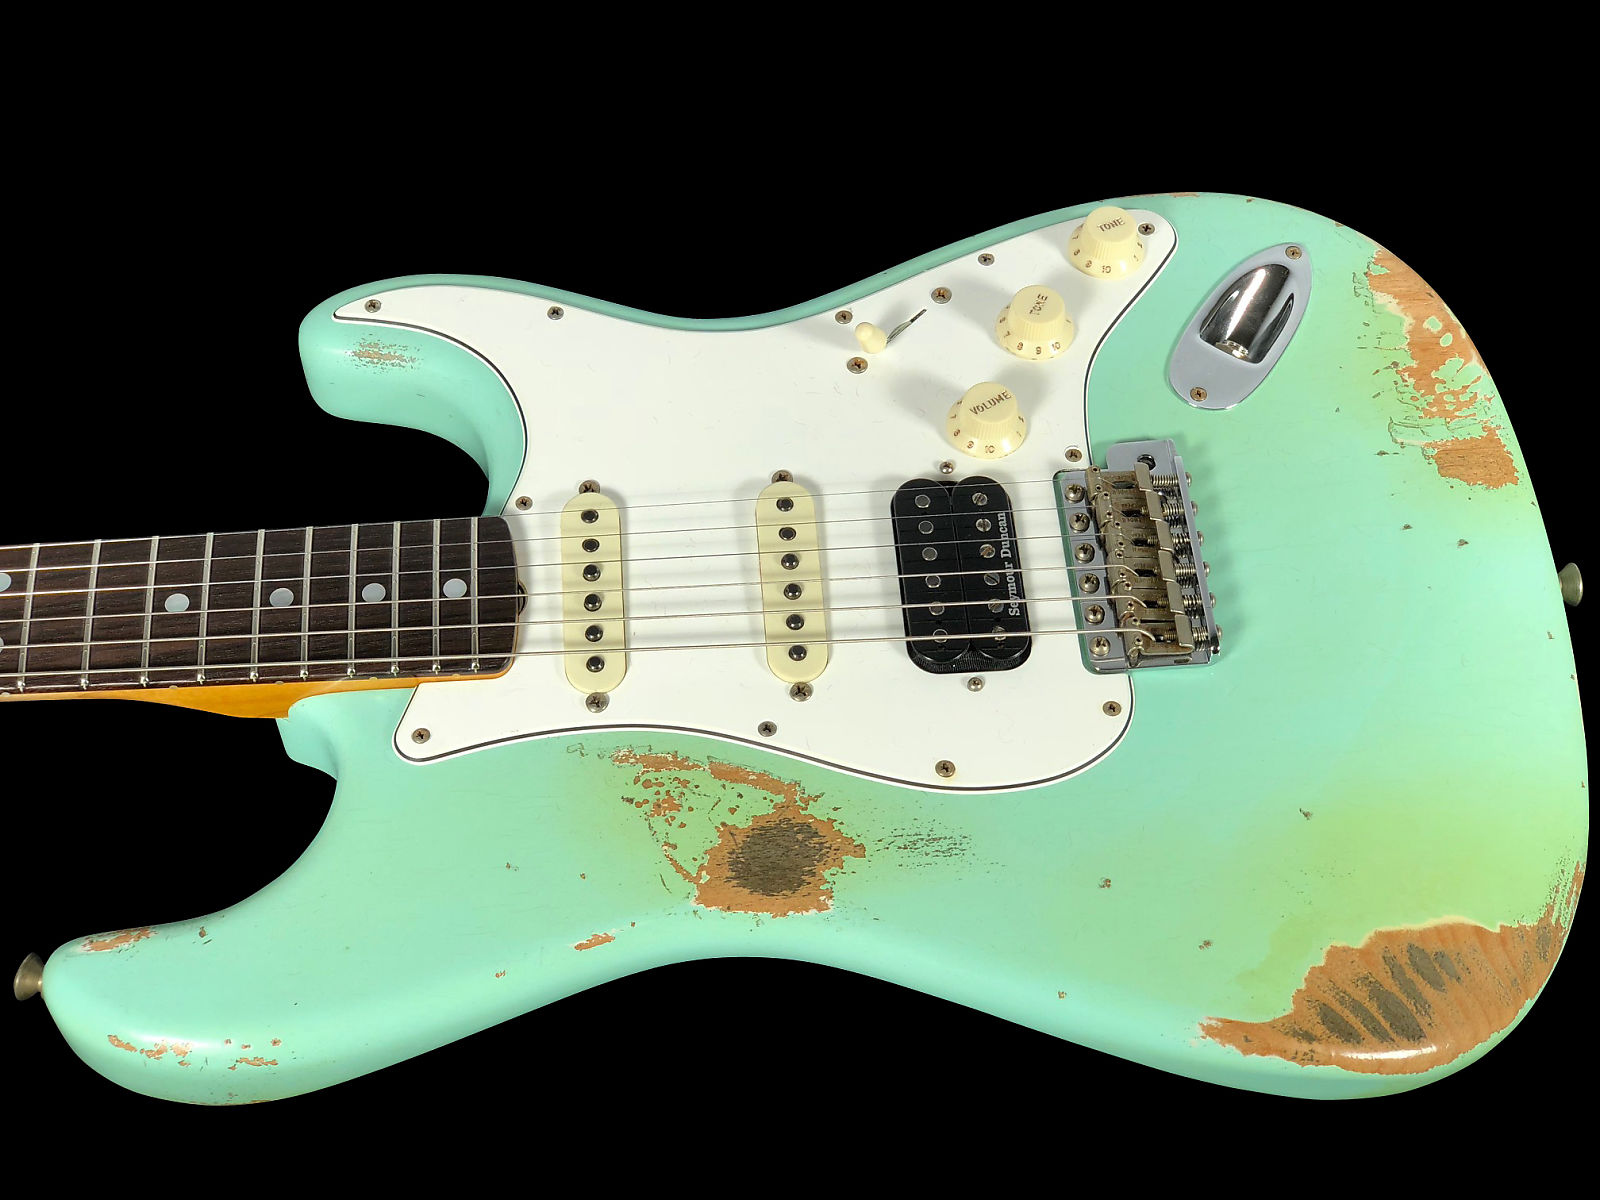 2018 Fender Stratocaster 1969 Custom Shop Heavy Relic 69 HSS Strat ...